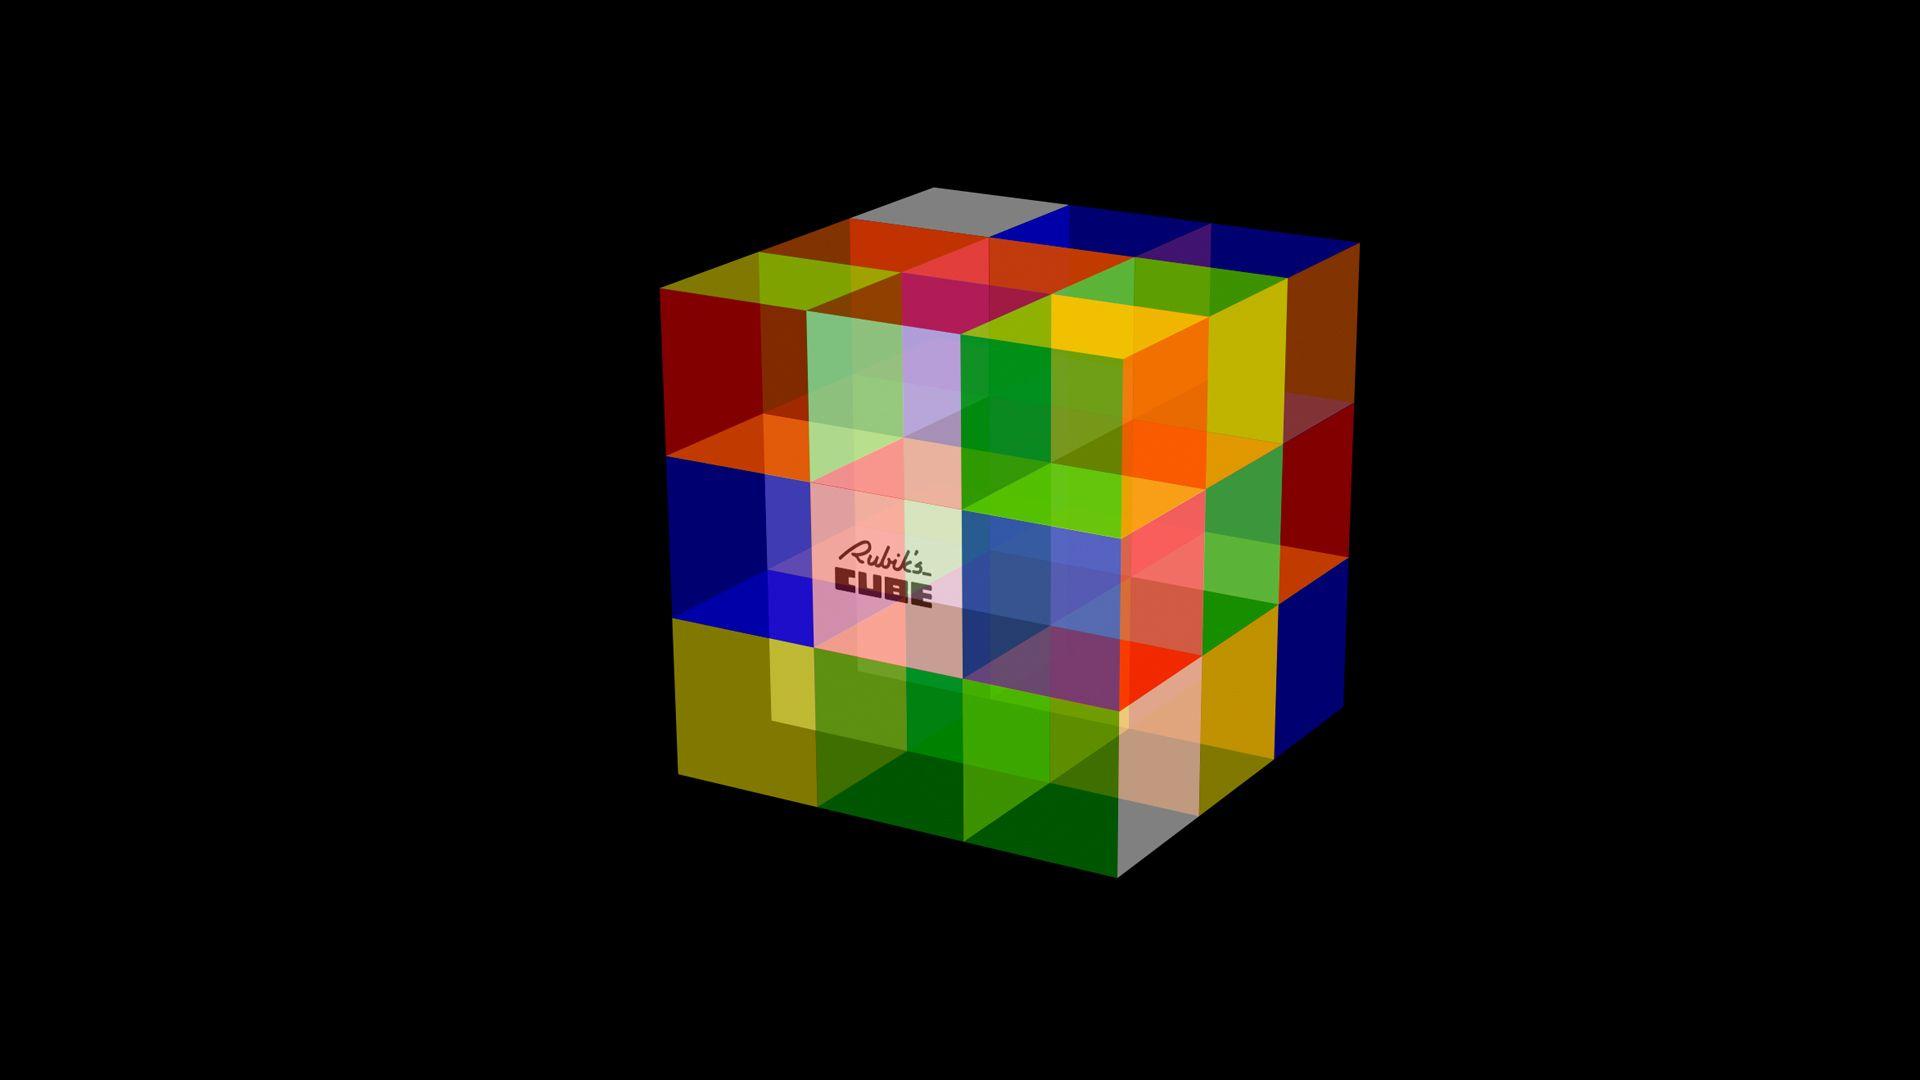 D Rubiks Cube Wallpaper Cube Desktop Wallpaper Free Hd Desktop Rubiks Cube Cube Rubics Cube